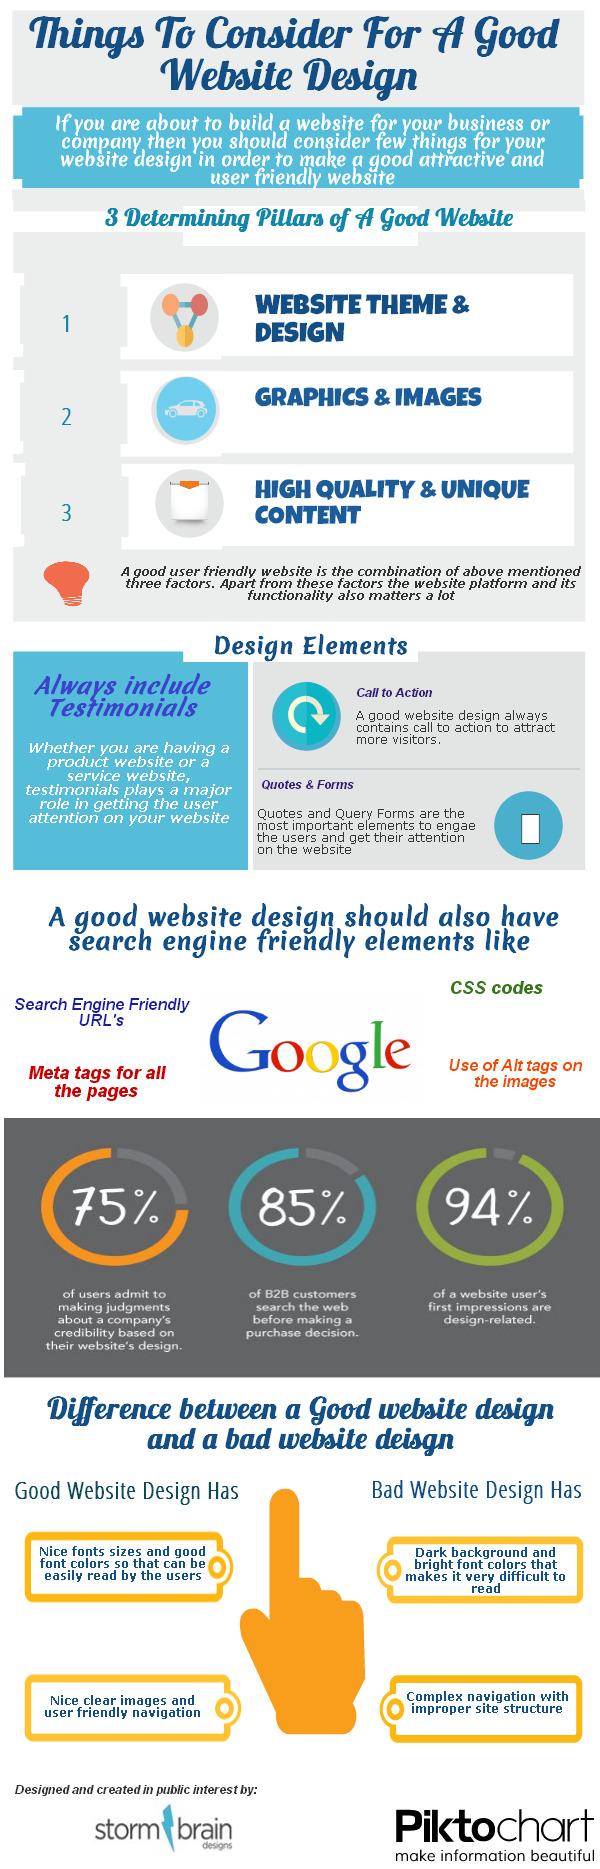 Aspectos a considerar en un buen diseño web